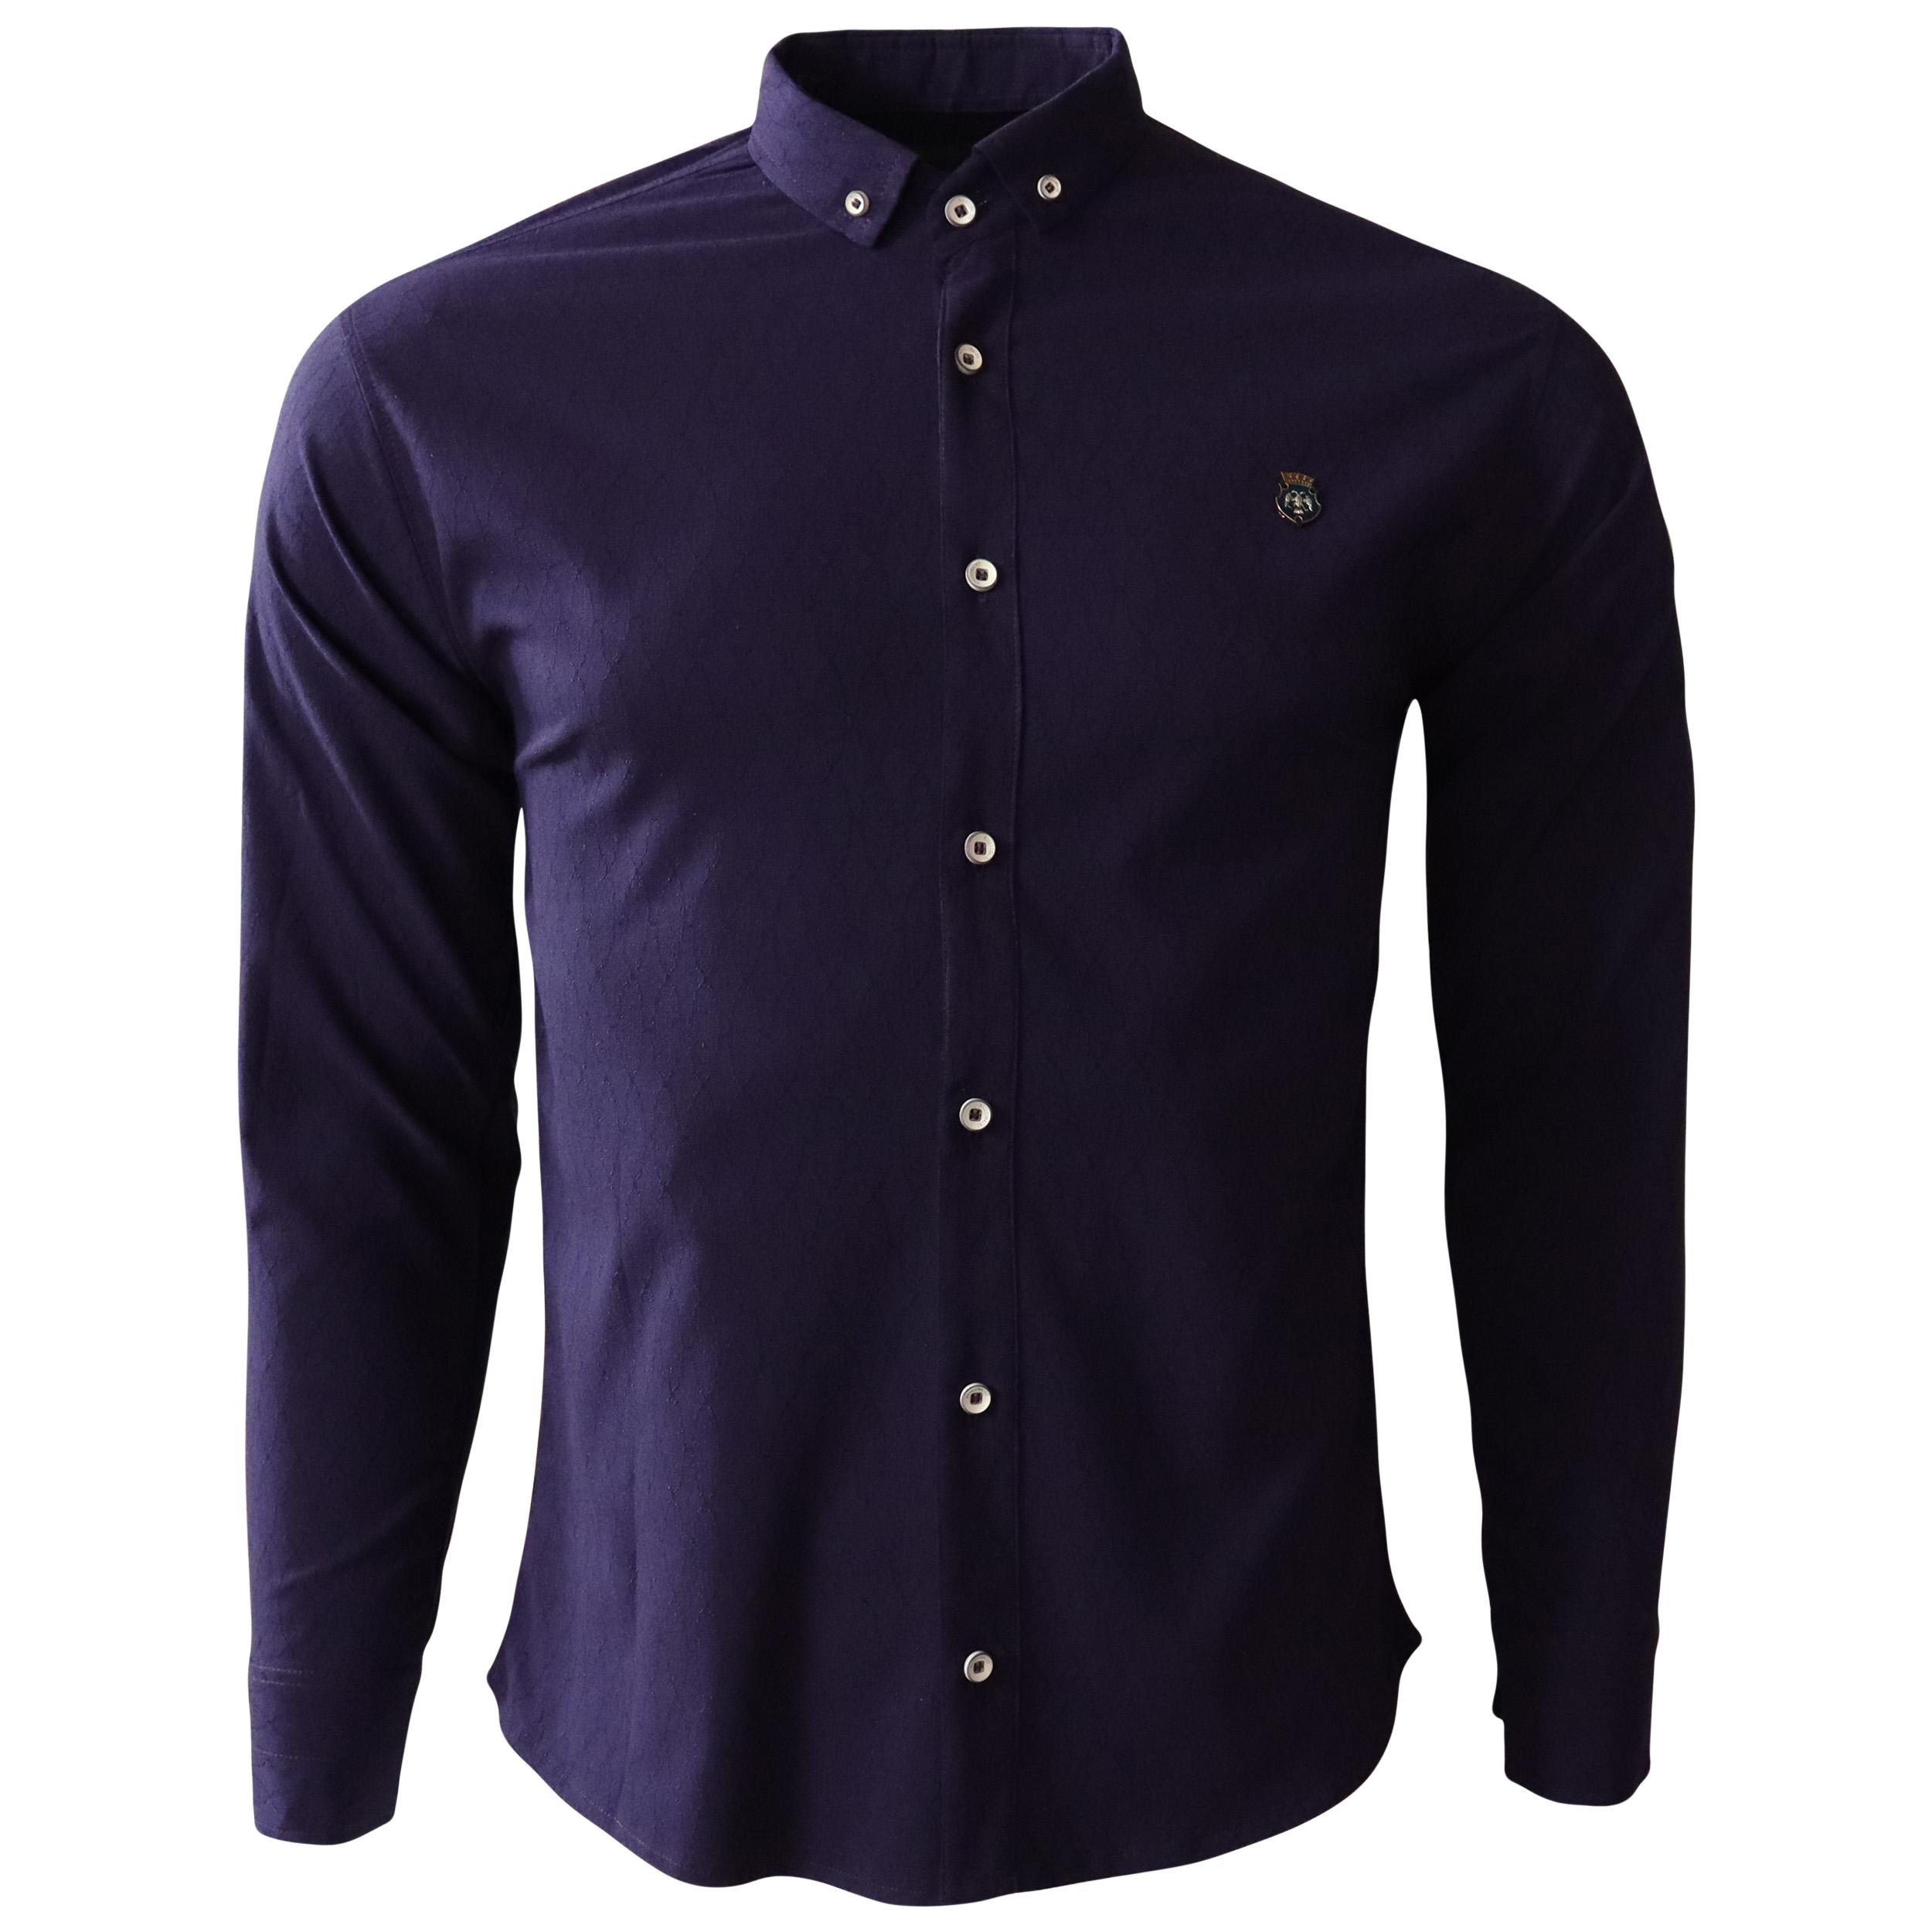 پیراهن مردانه مدل rm9966 thumb 2